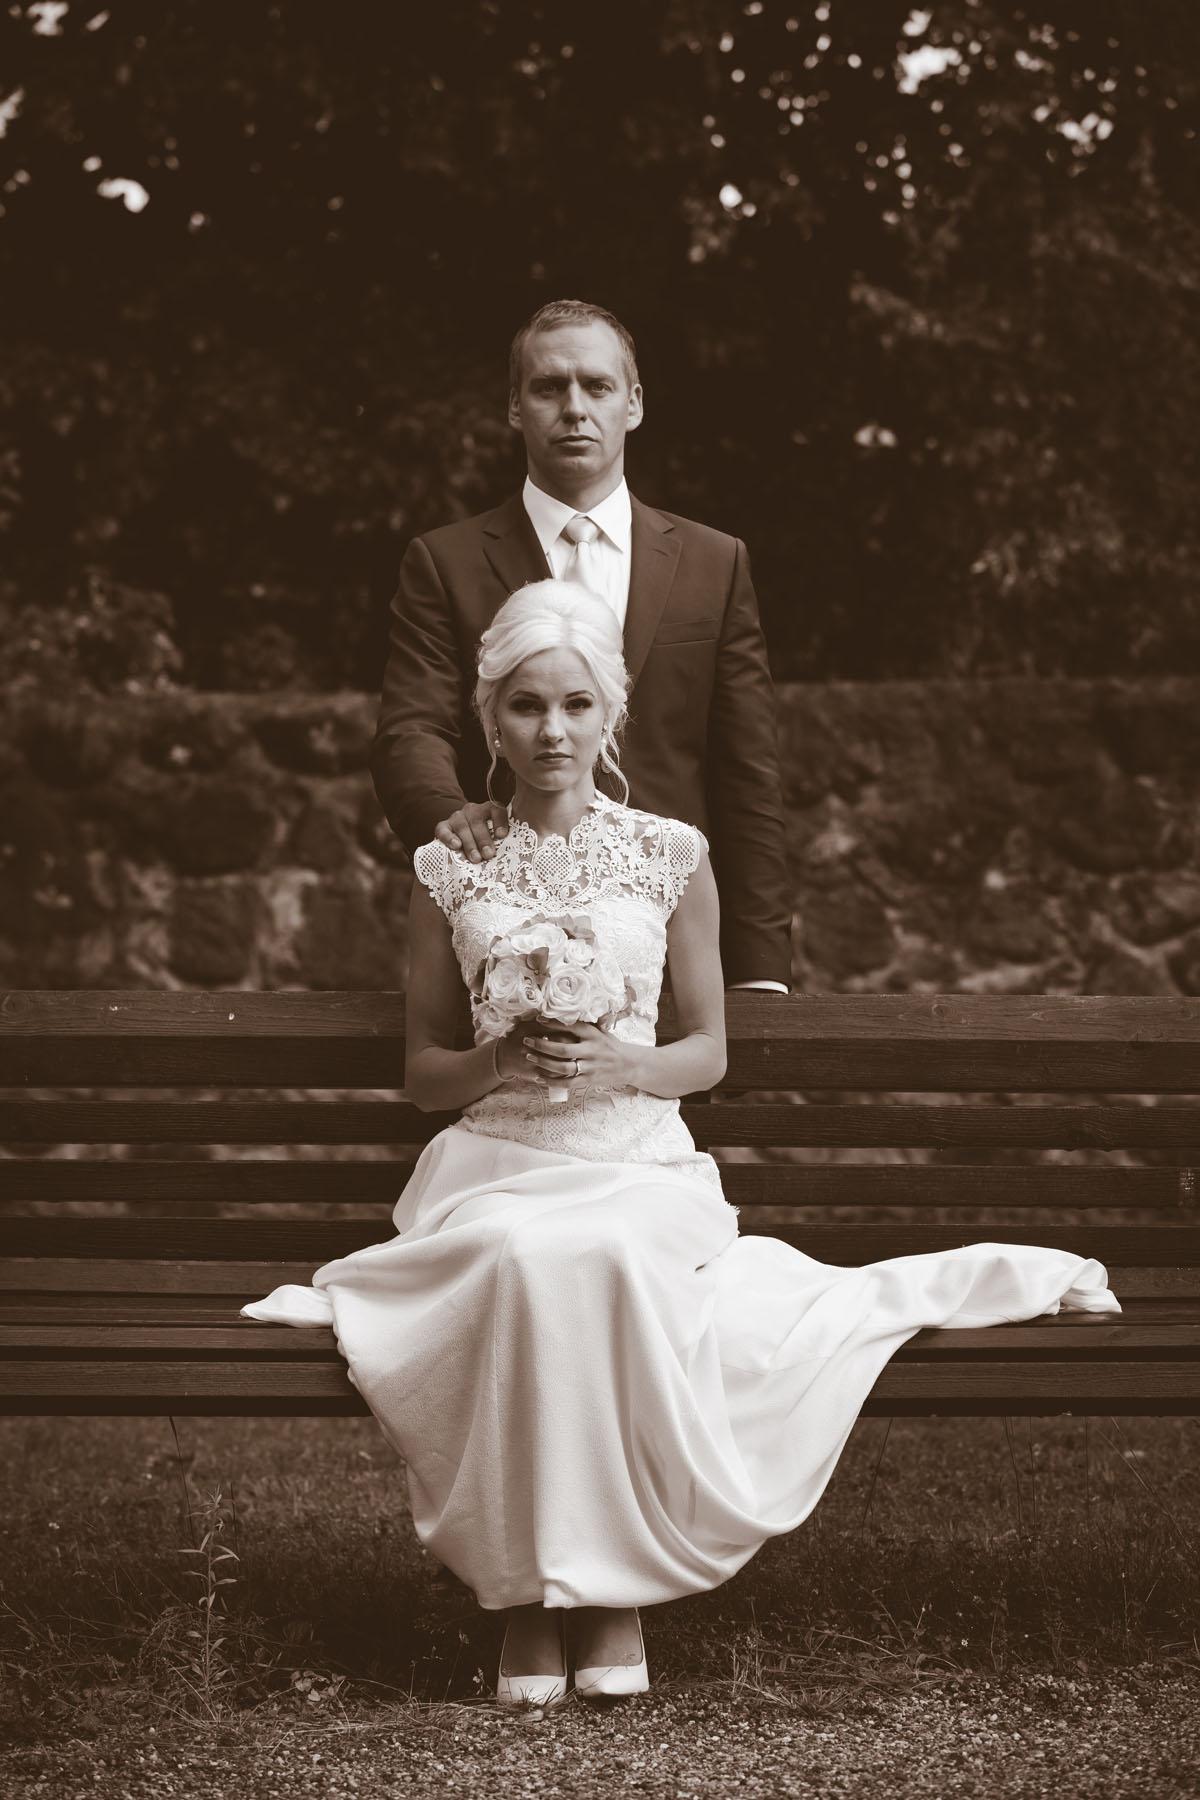 wedding-photos-061-estonian-wedding-photographer.jpg